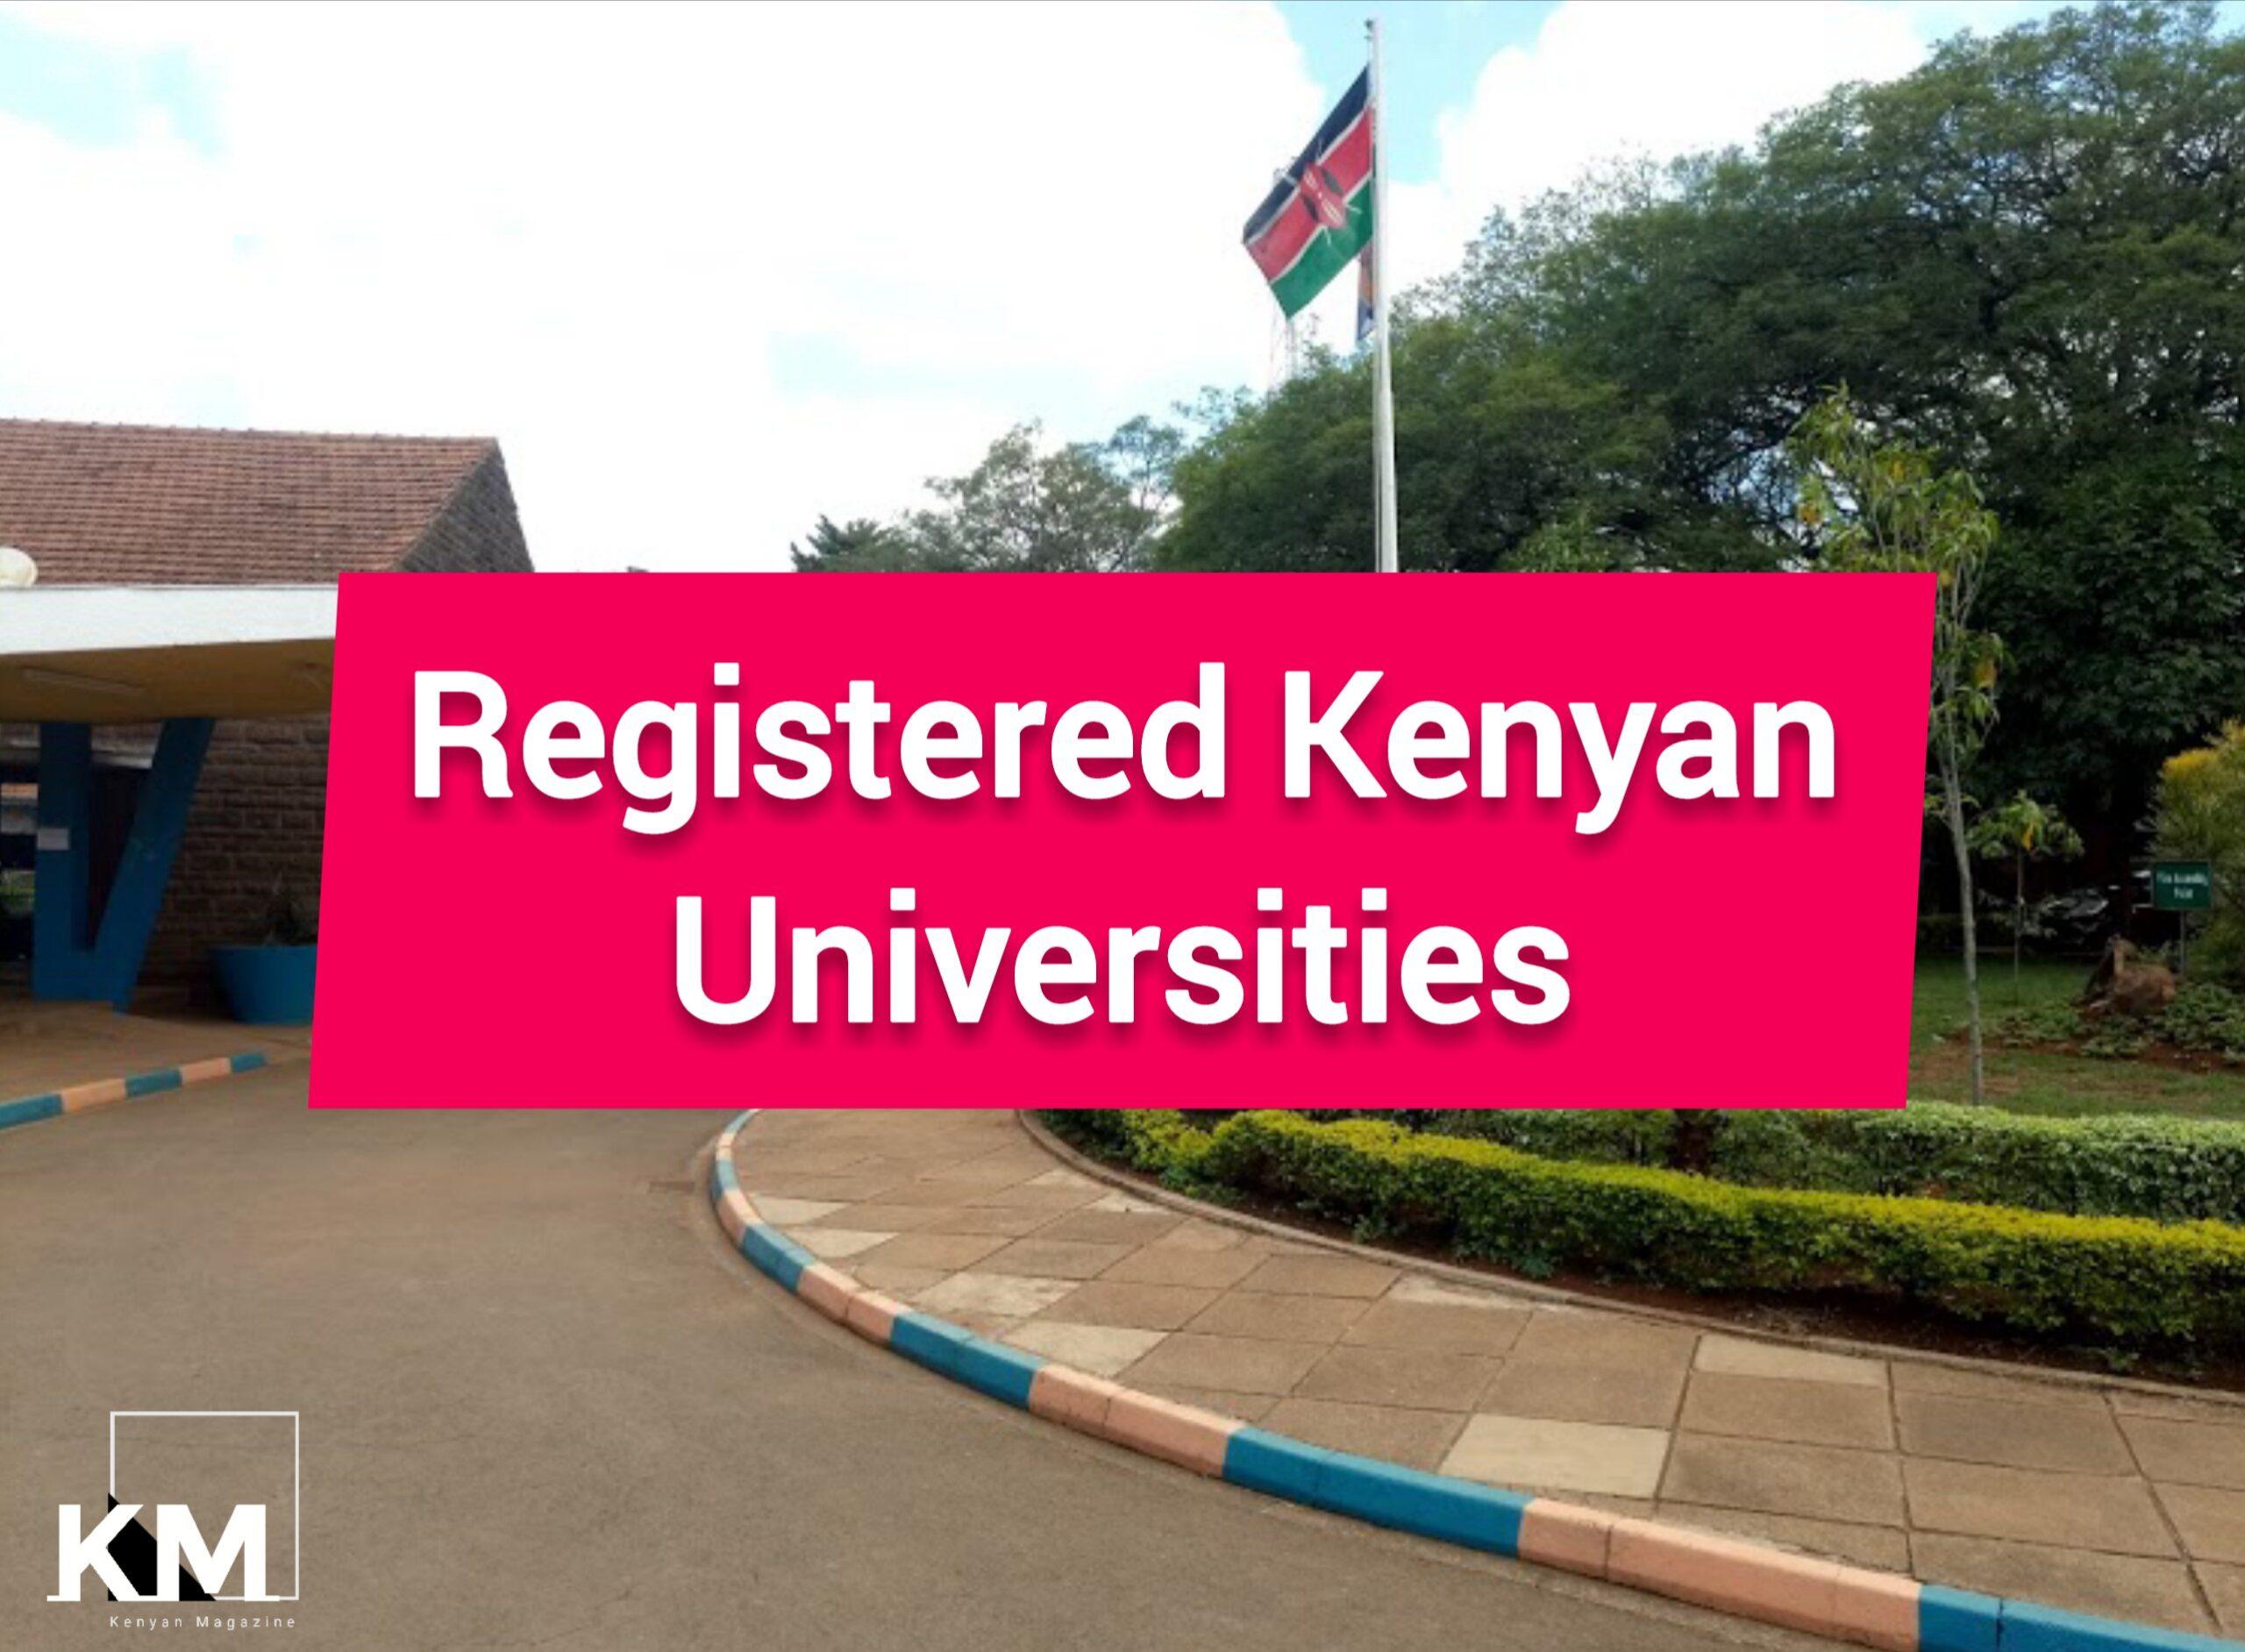 Registered Kenyan Universities